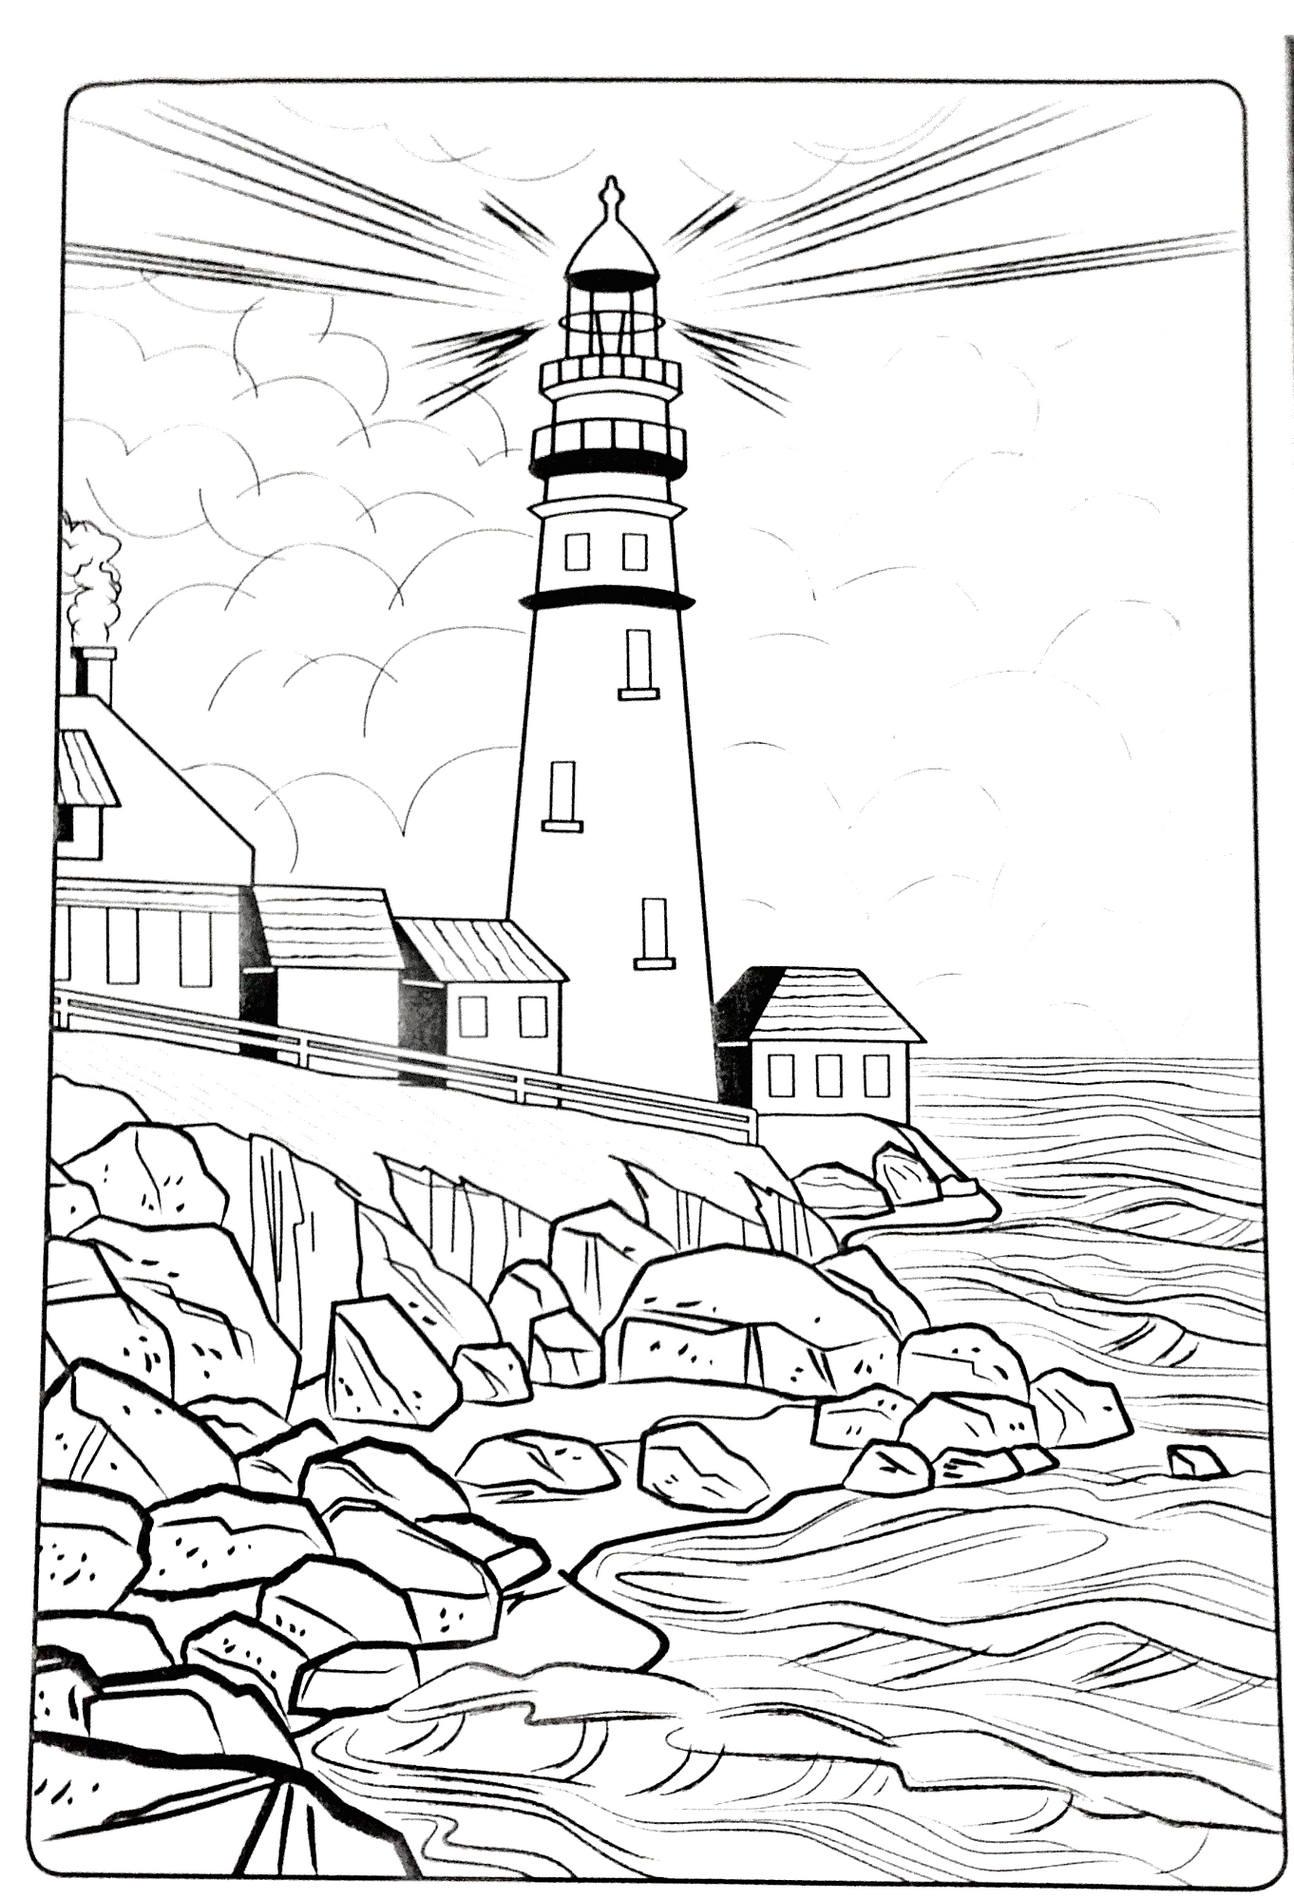 Mewarnai Sketsa Gambar Pemandangan Bawah Laut Terbaru